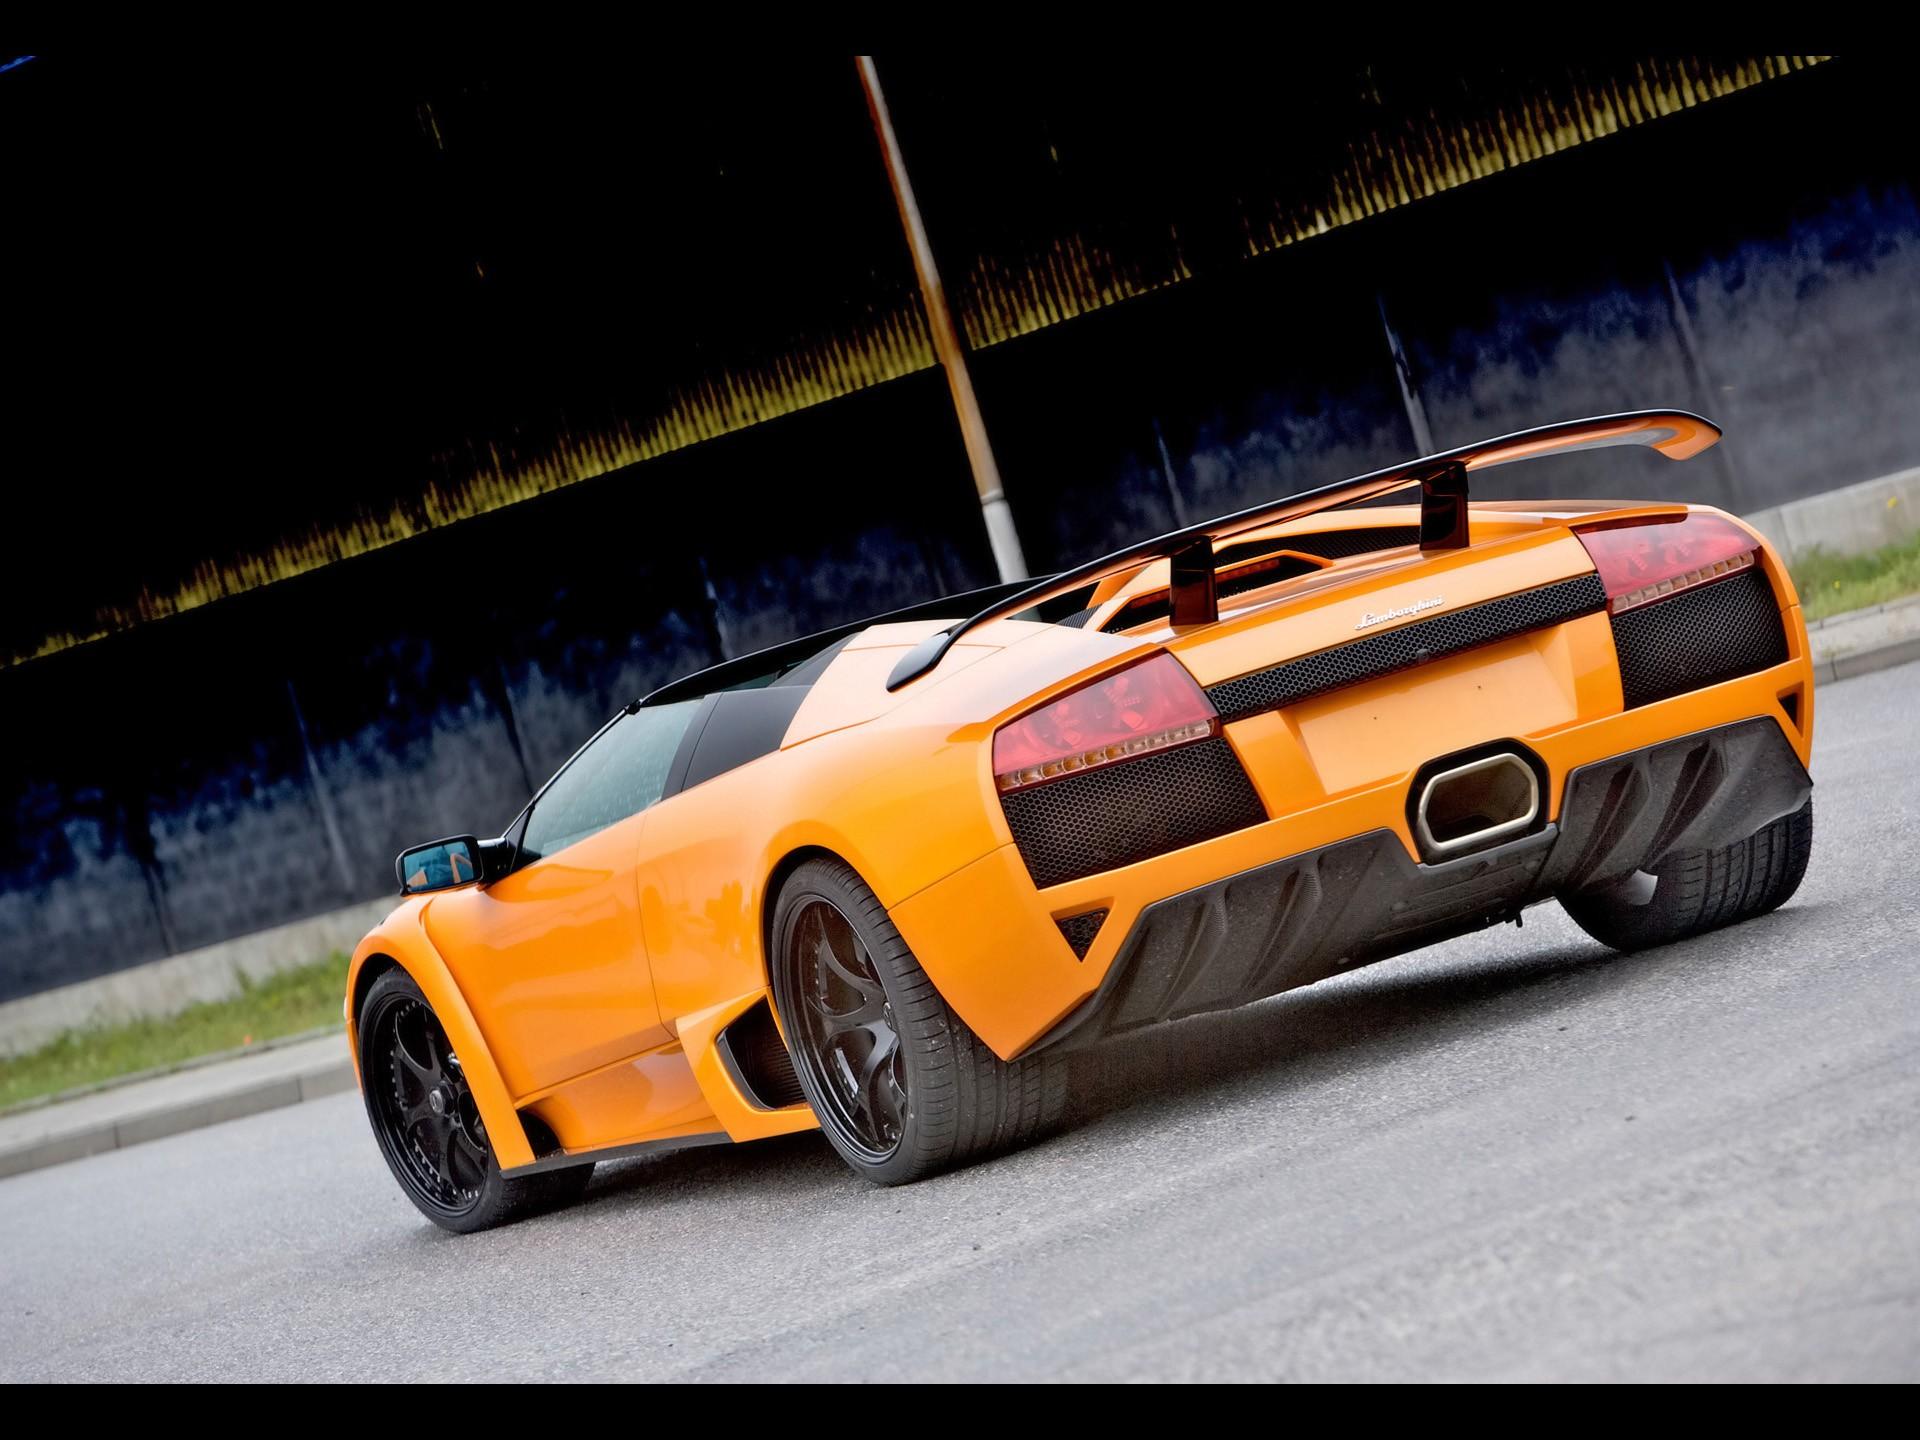 Cars Backview Vehicles Lamborghini Murcielago Orange Cars Exotic